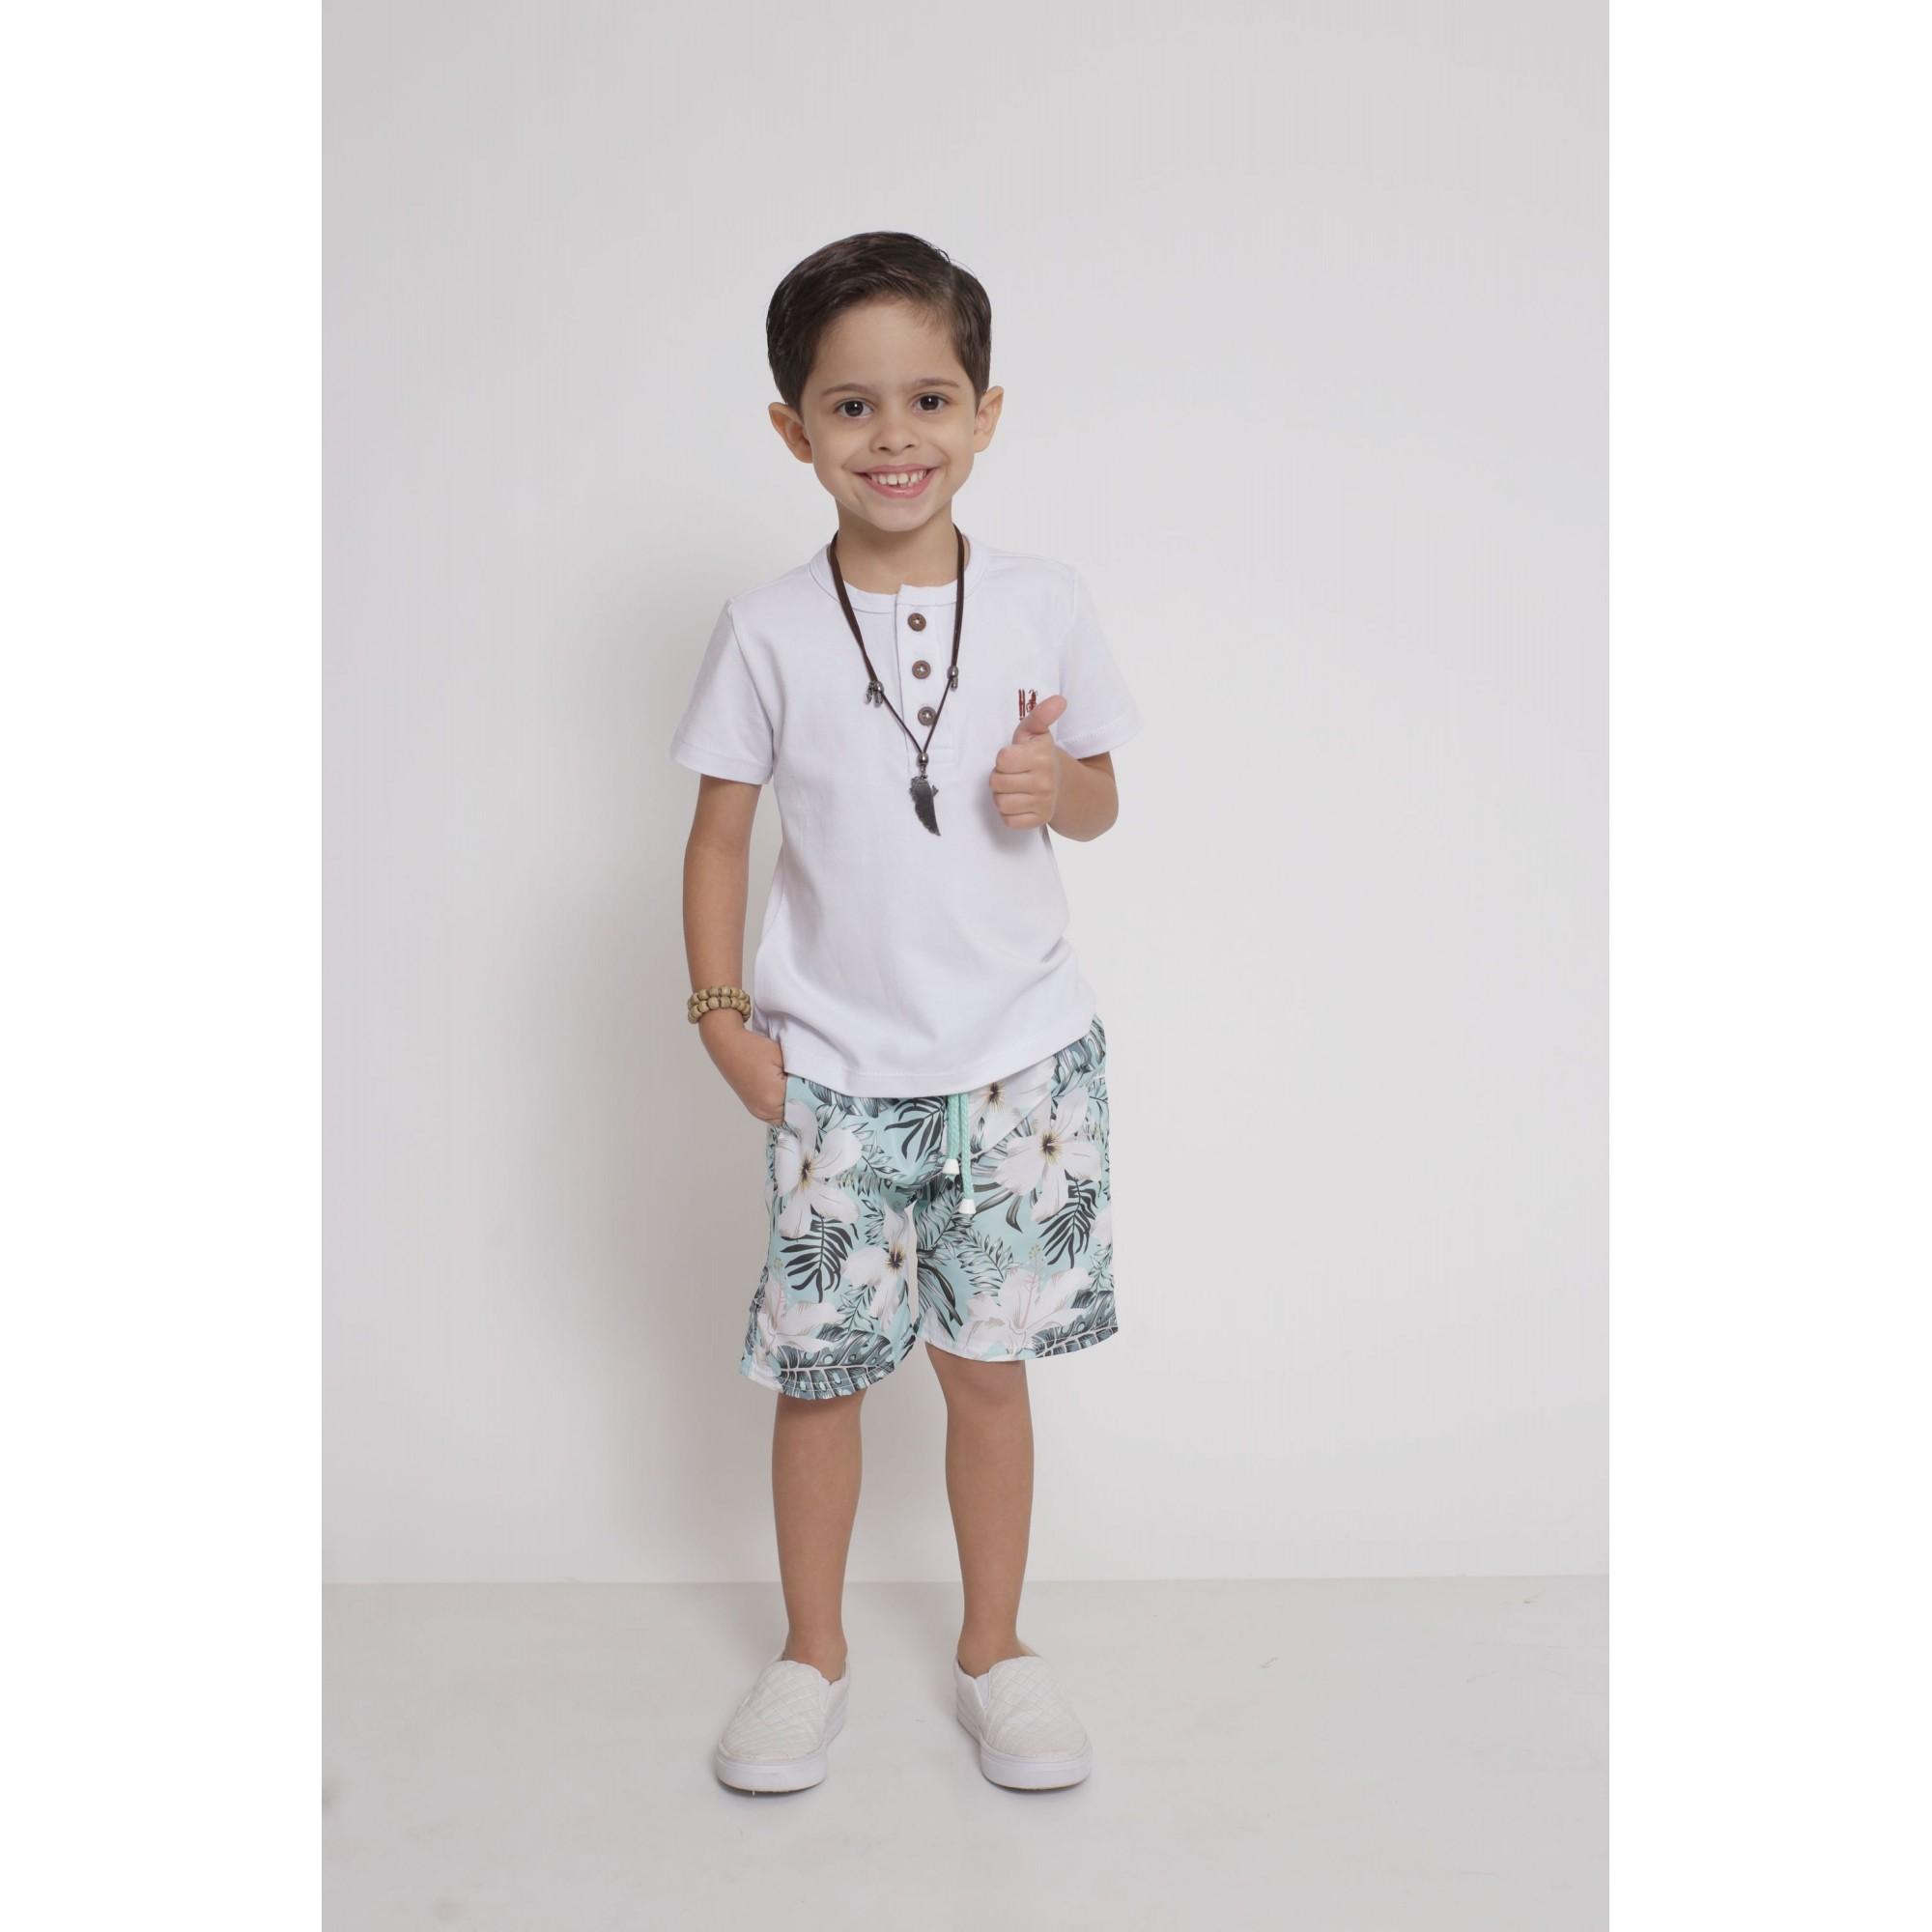 Bermuda Infantil Flores Tactel  - Heitor Fashion Brazil